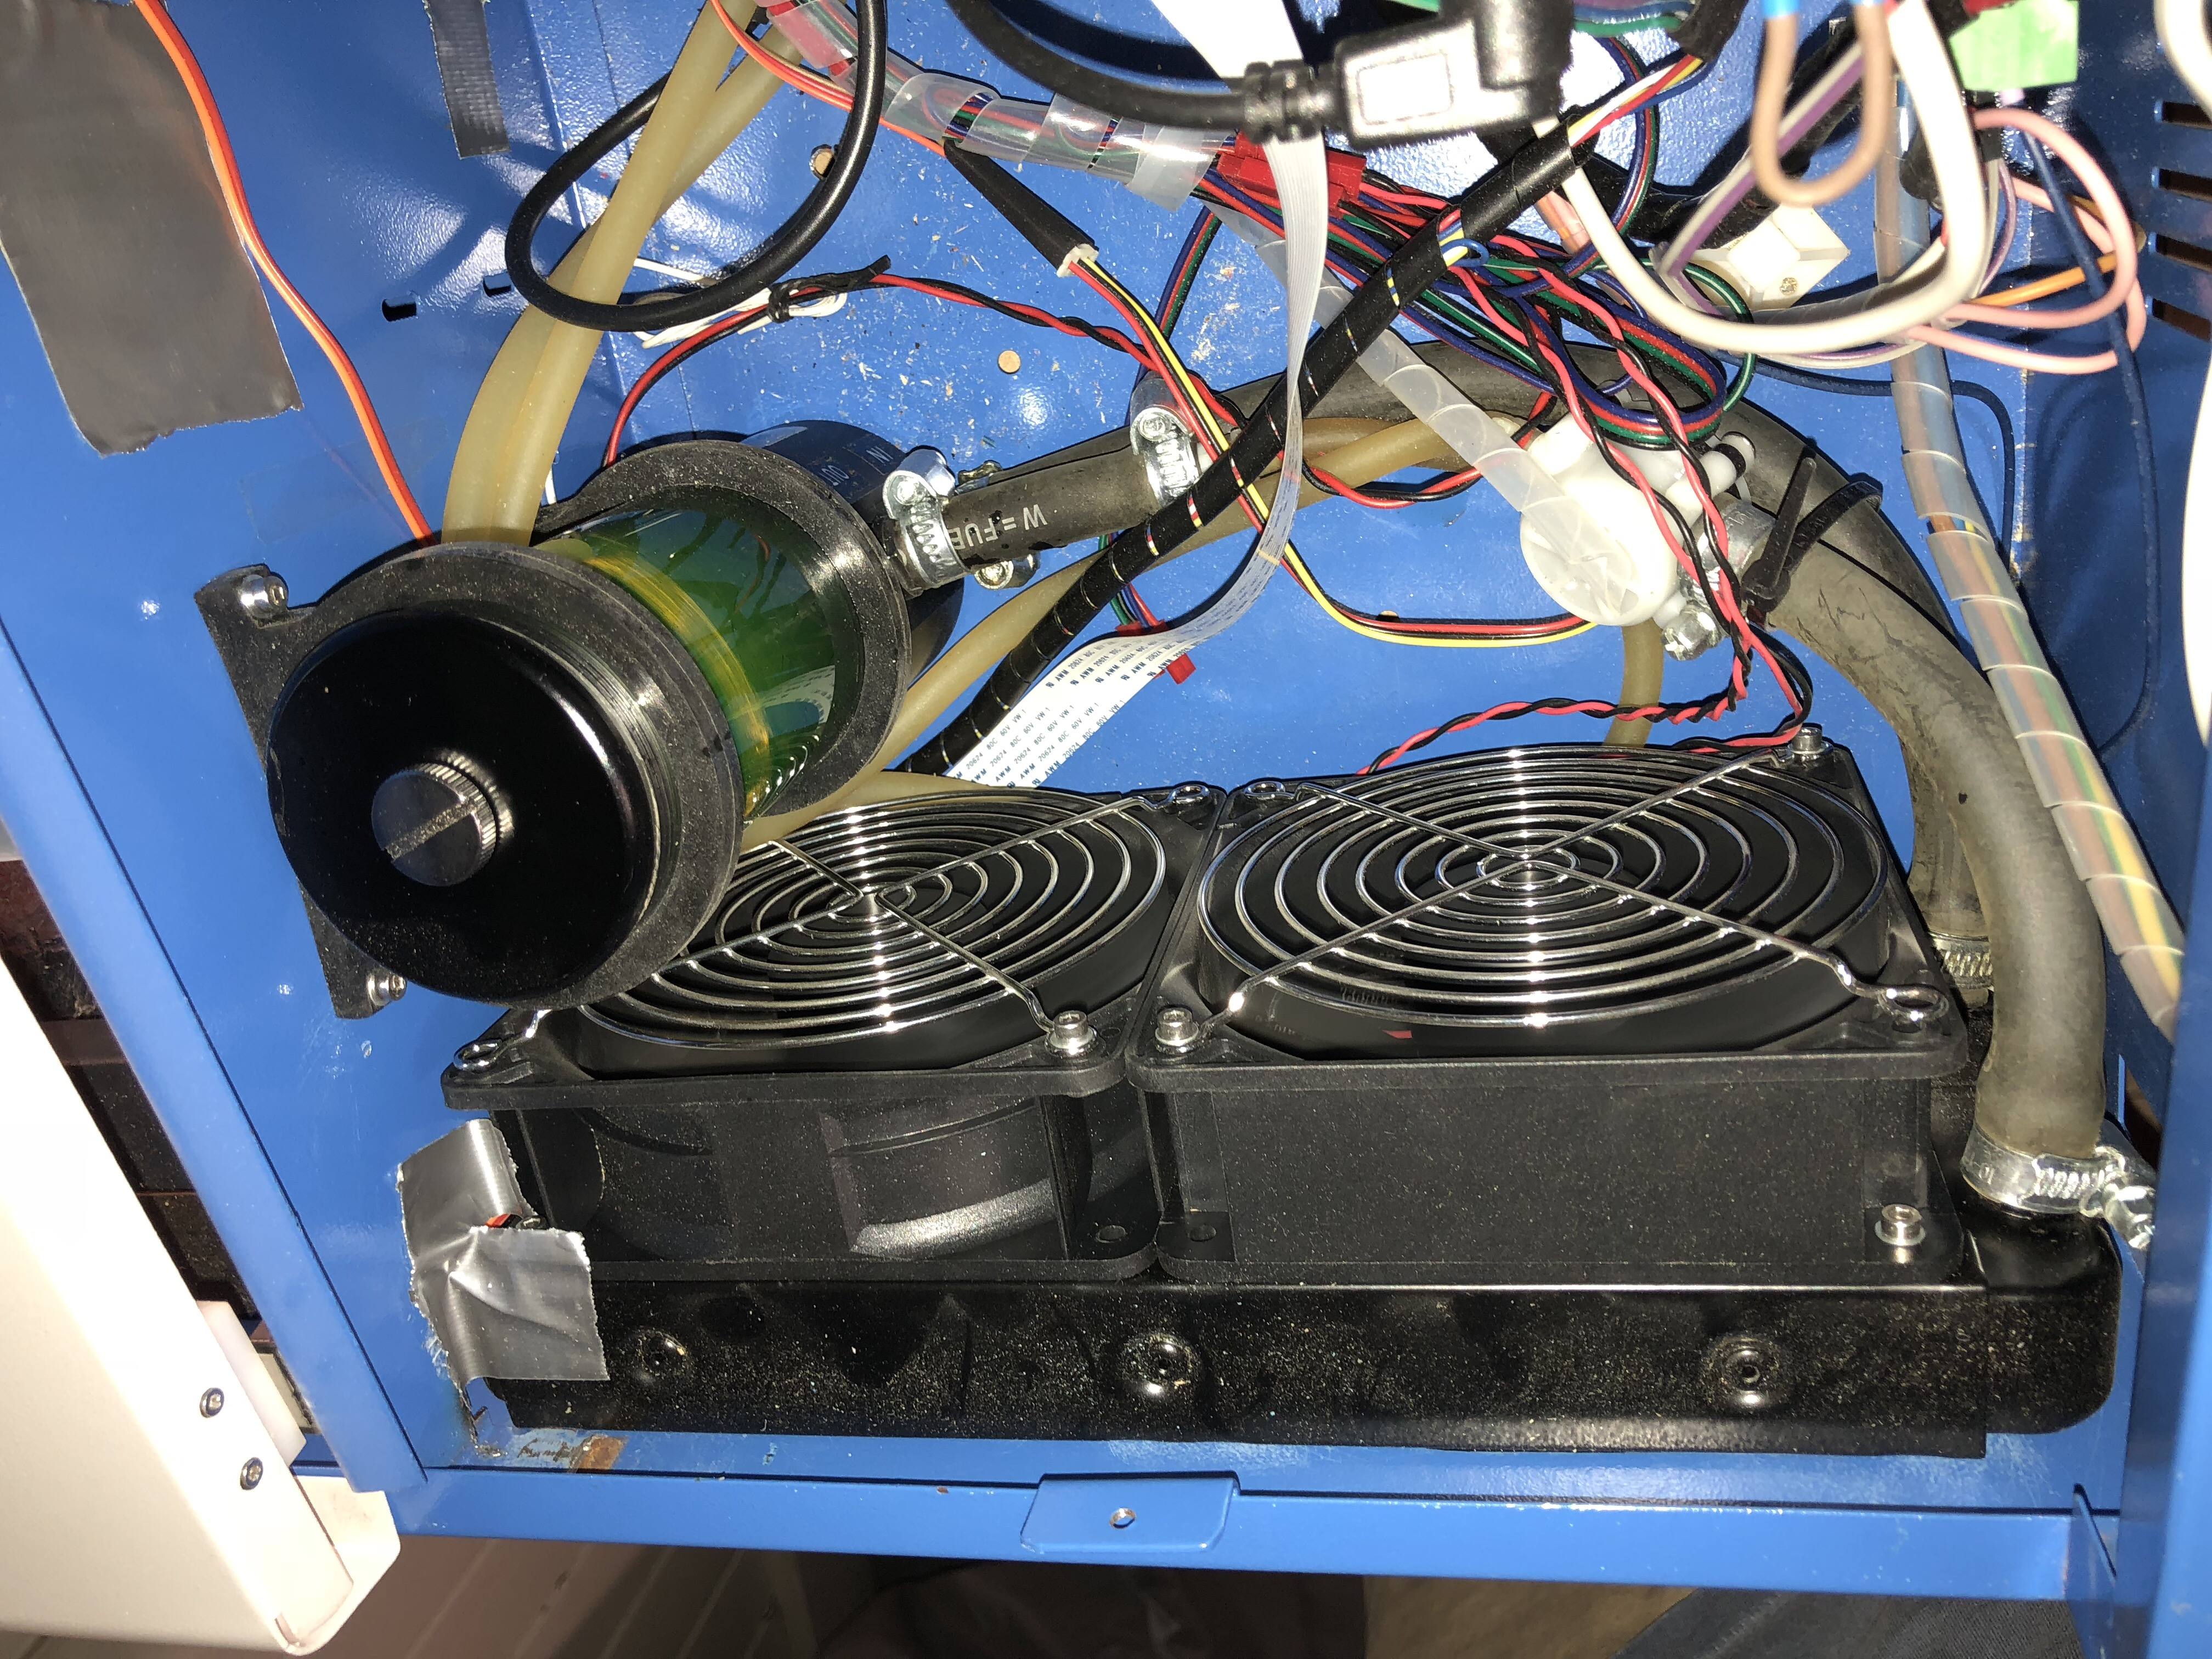 Chinese Laser Cutter K40 Upgrade – Simple Stuff Matters